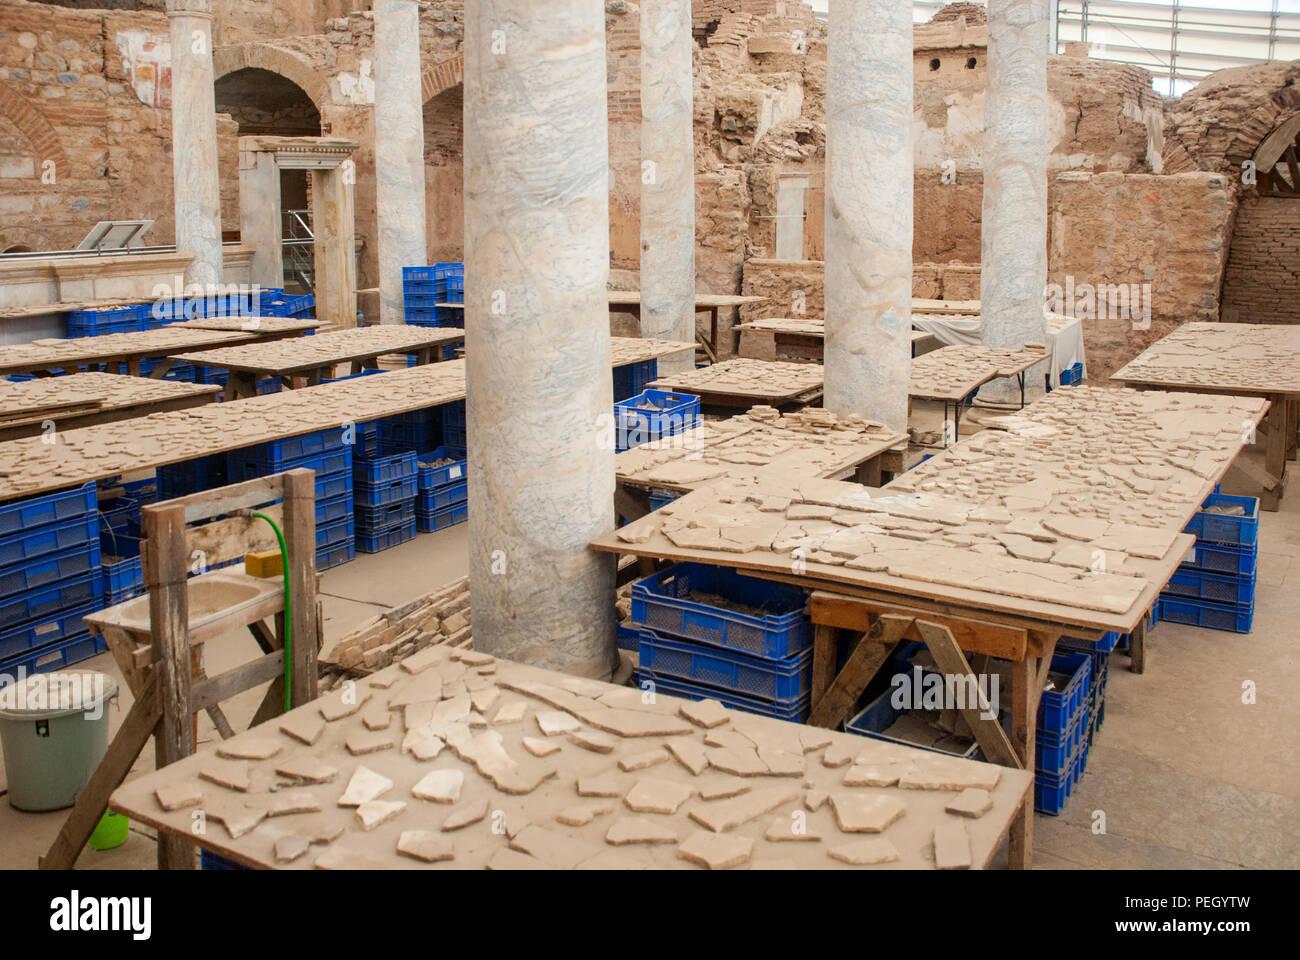 Restoration of archaeological findings in terrace houses, ephesus, izmir, turkey - Stock Image